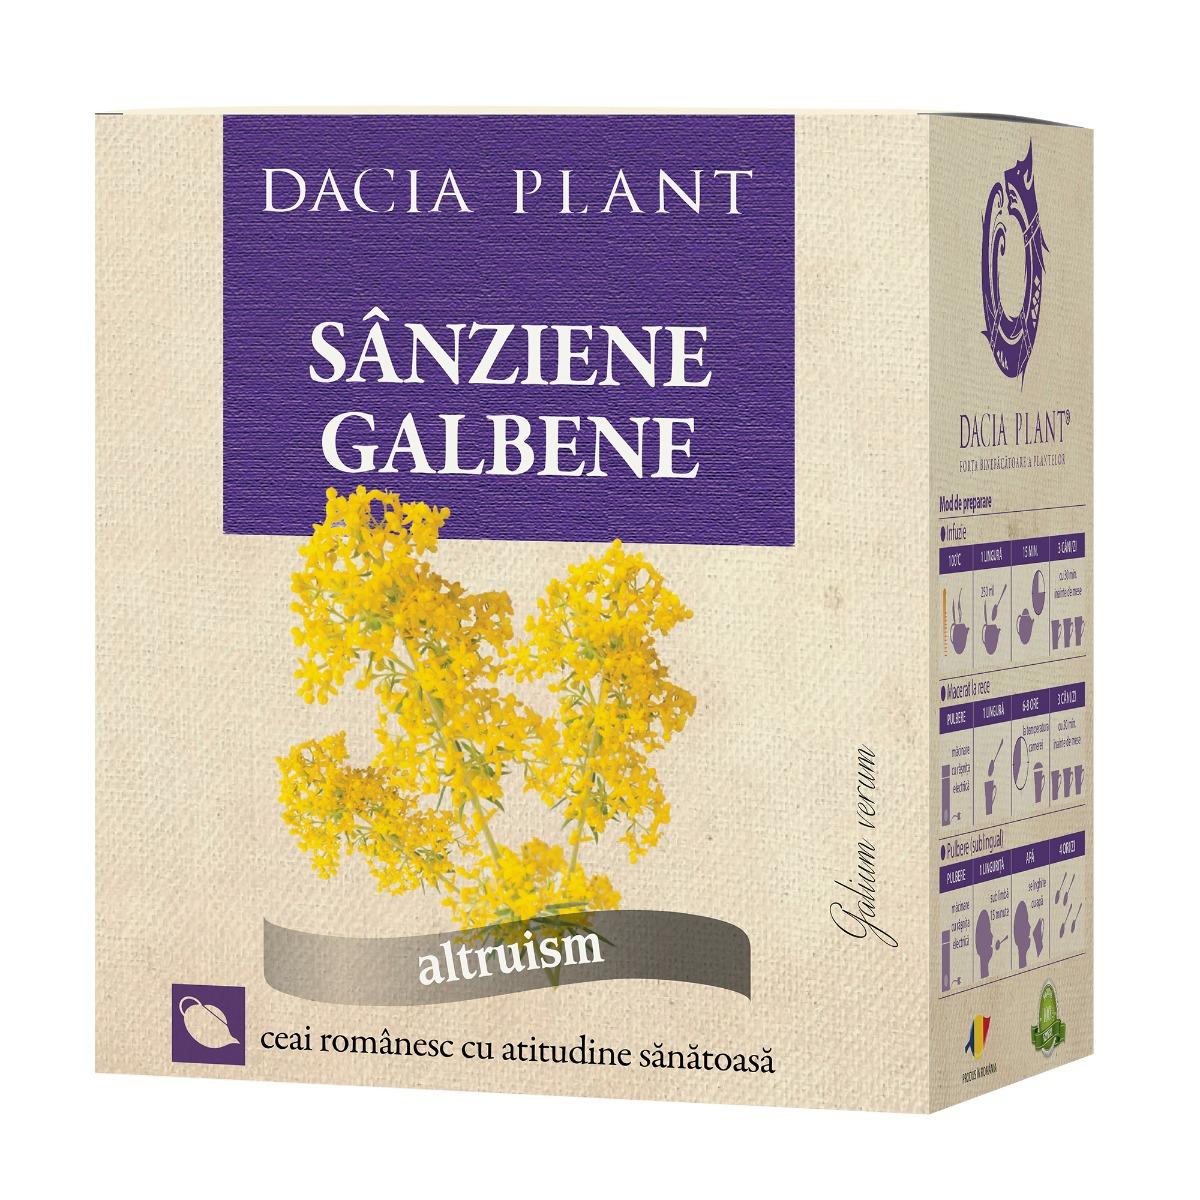 Ceai de sanziene galbene, 50g, Dacia Plant drmax.ro